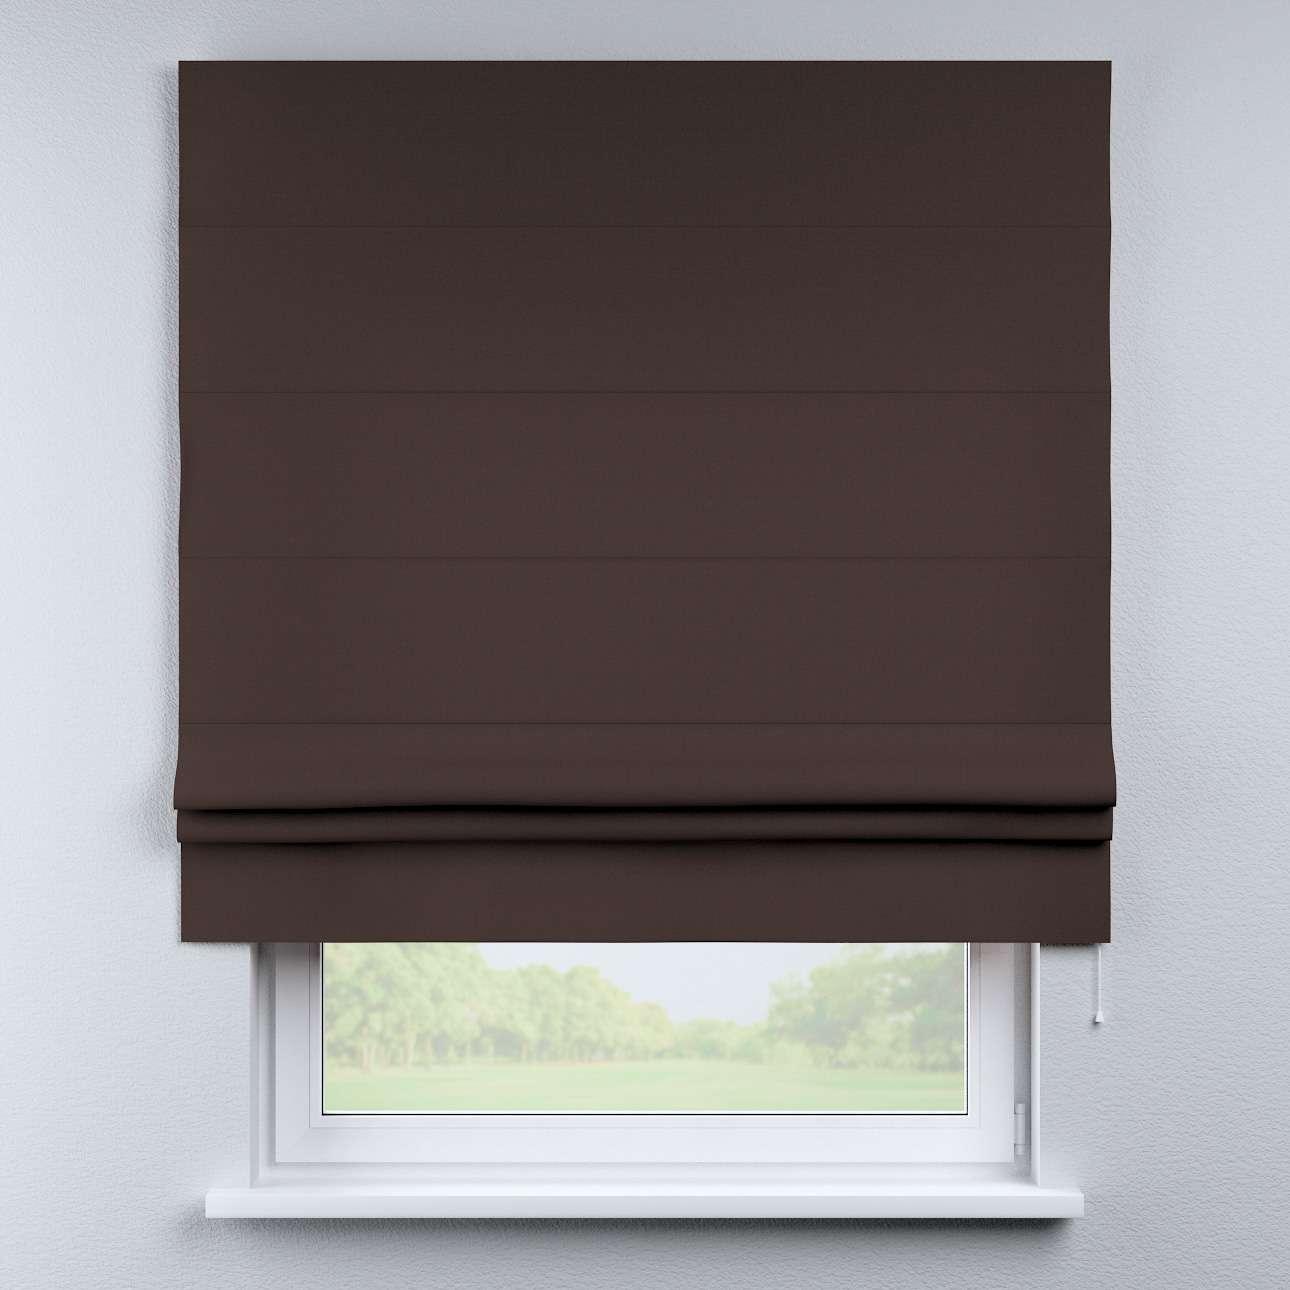 Foldegardin Paris<br/>Med lige flæse 80 x 170 cm fra kollektionen Cotton Panama, Stof: 702-03